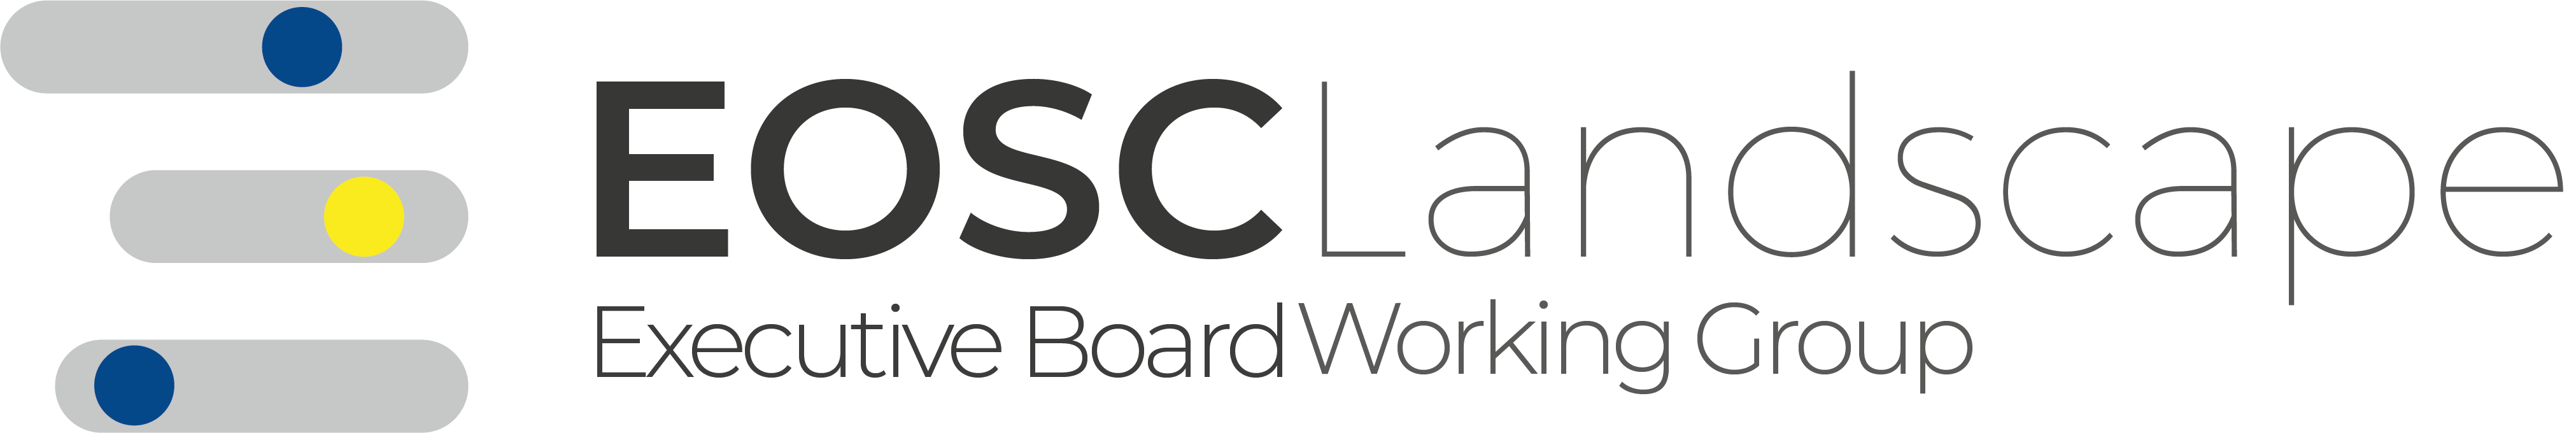 EOSC Landscape WG Logo.png